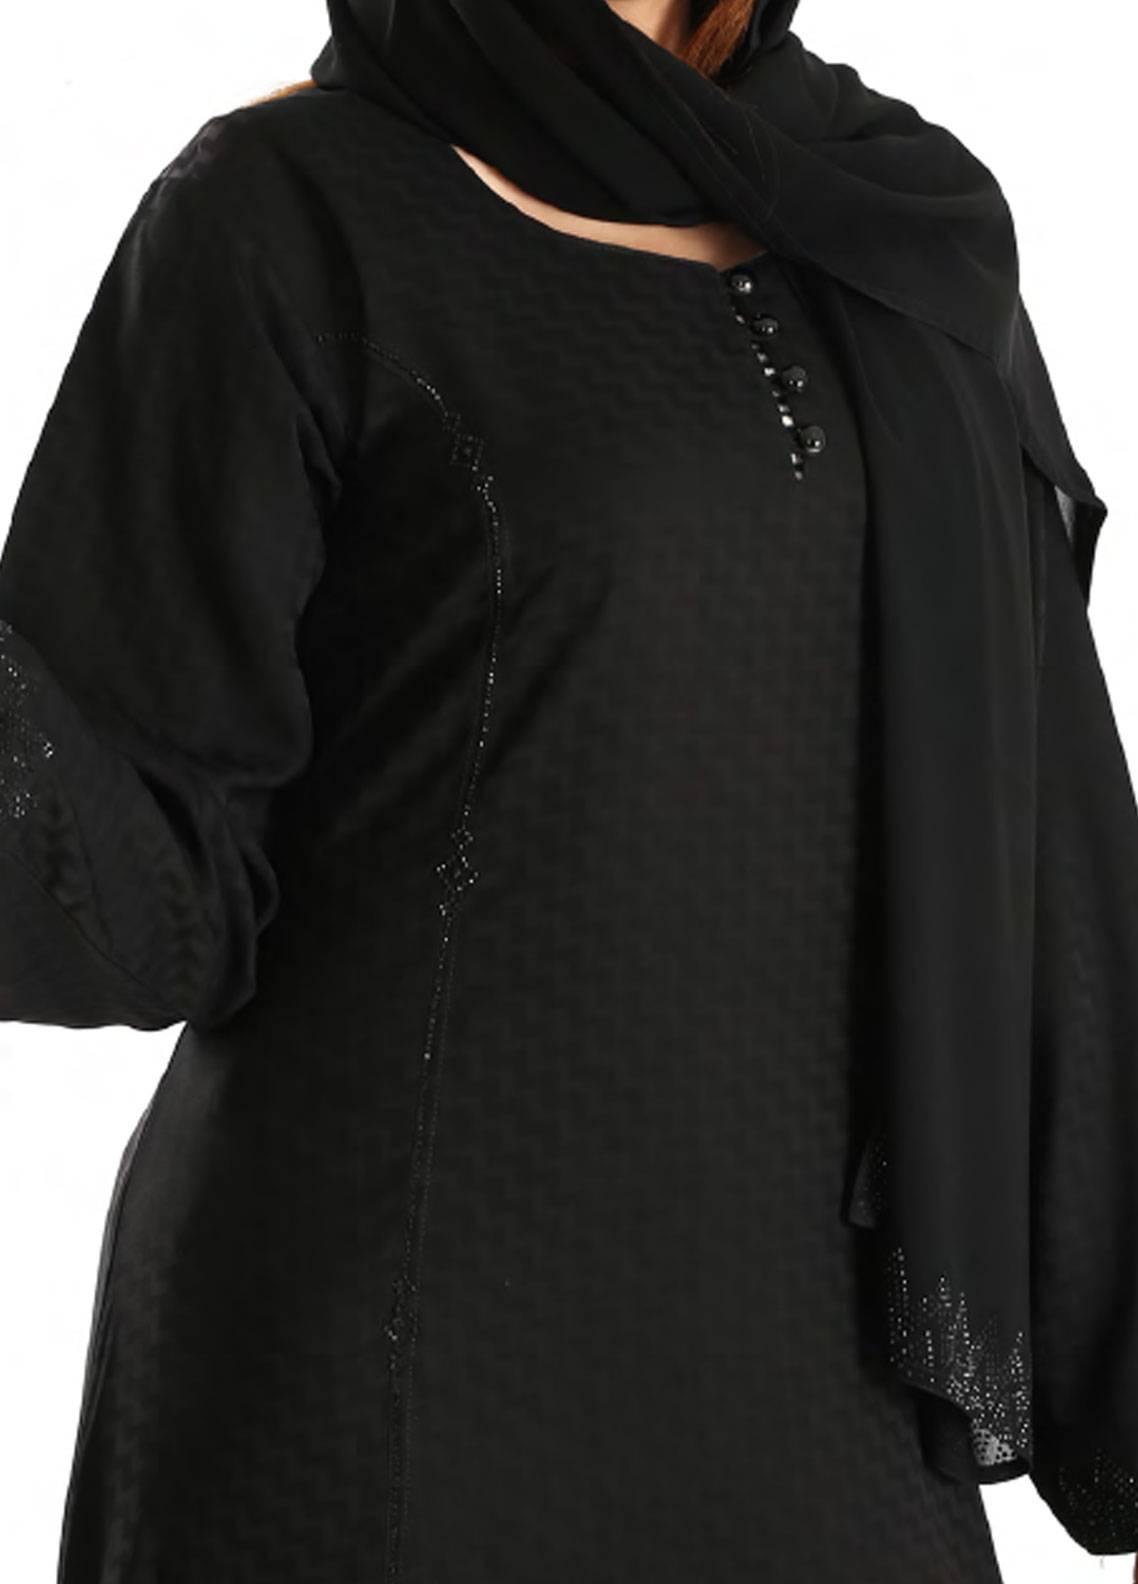 Hijab ul Hareem Pullover  Stitched Abaya 0120-C-906